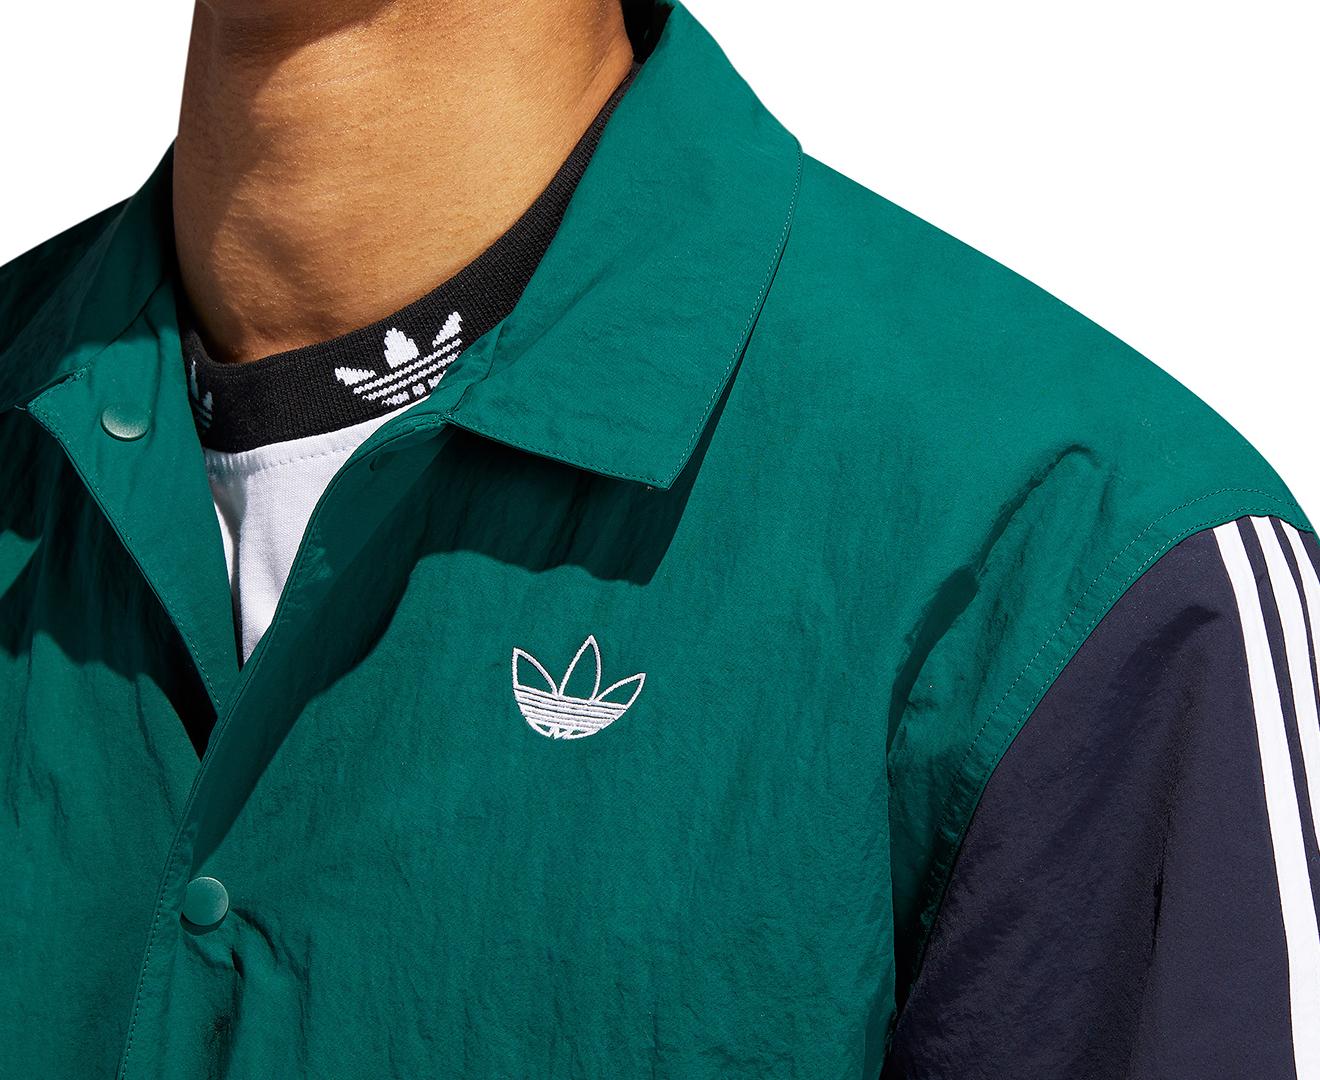 Adidas Originals Men's Trefoil Coach Jacket Collegiate GreenLegend Ink